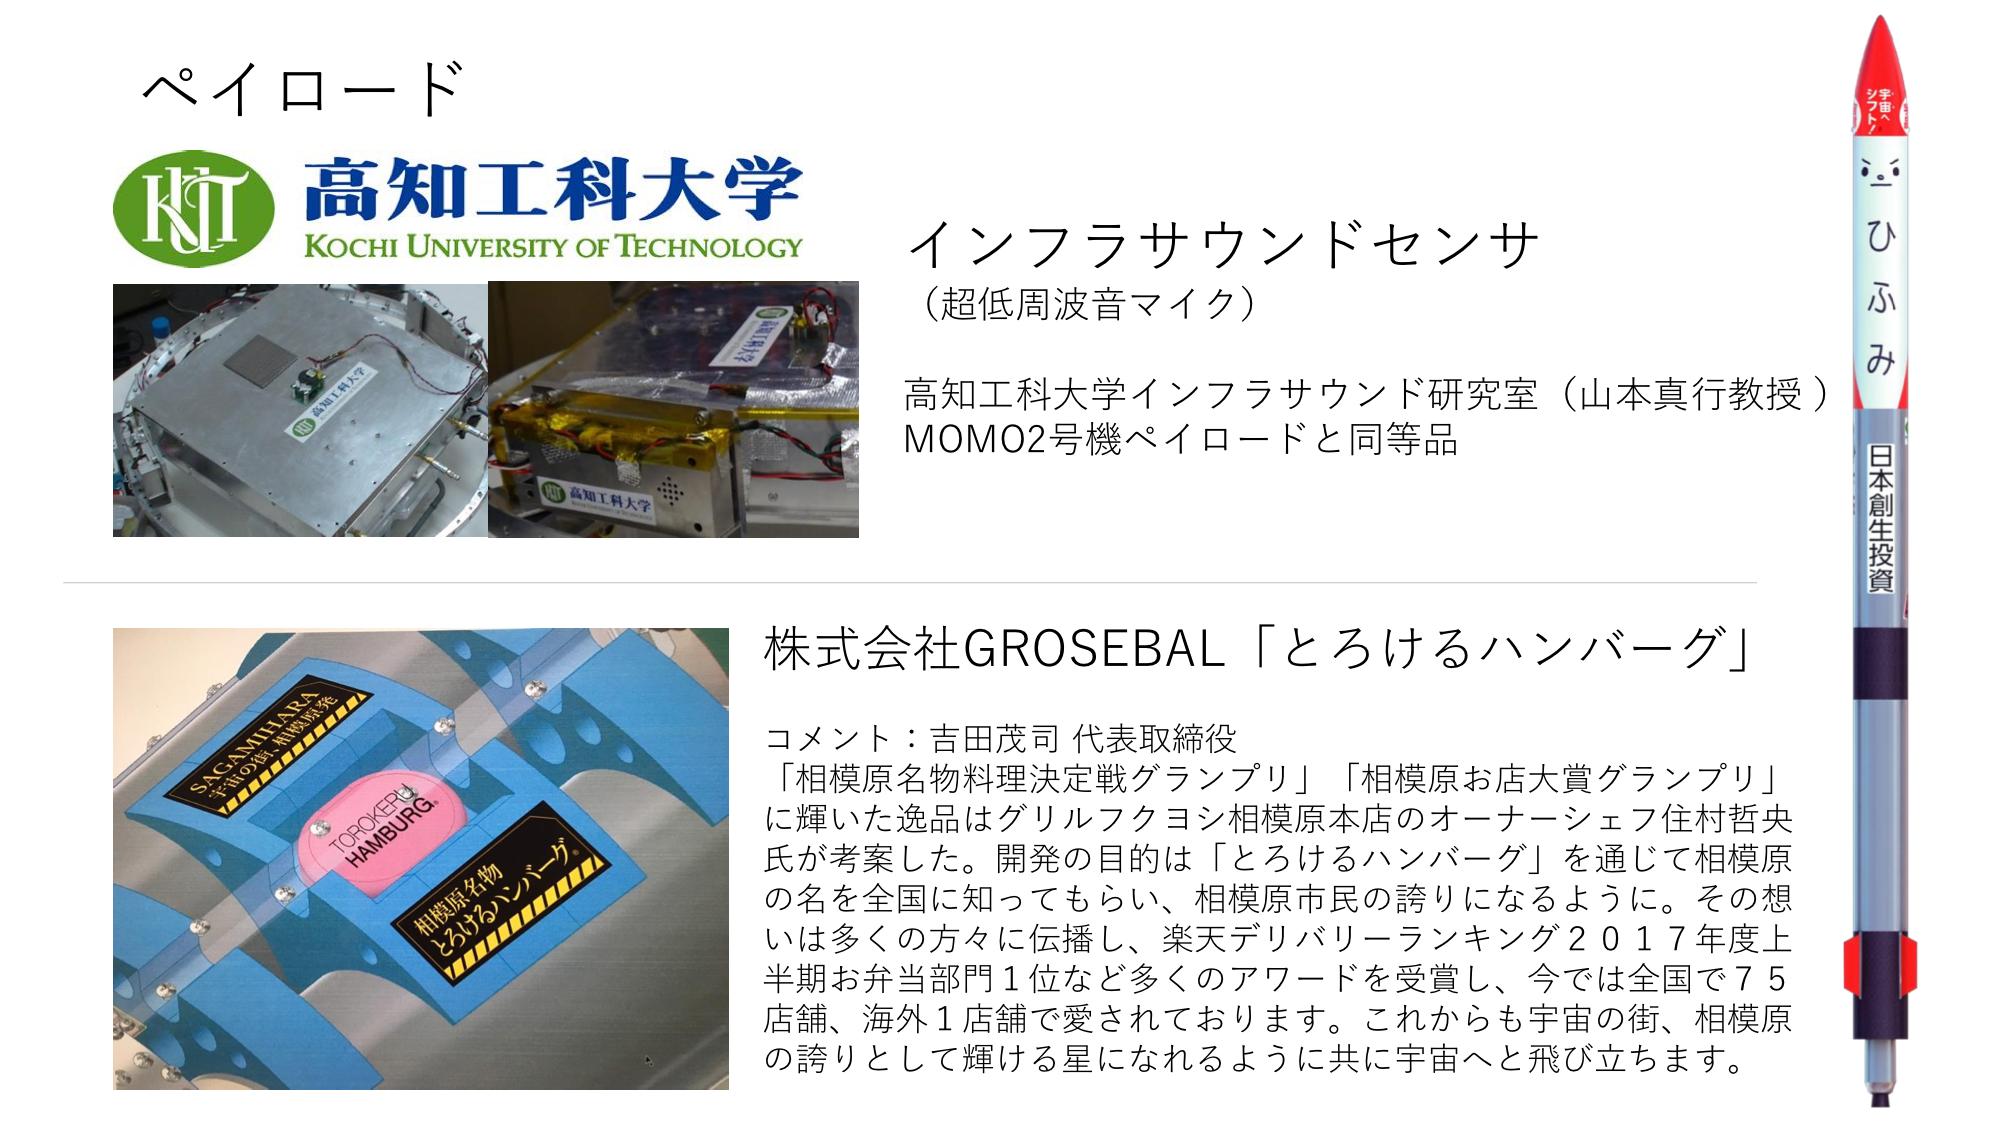 f:id:Imamura:20190414214000p:plain